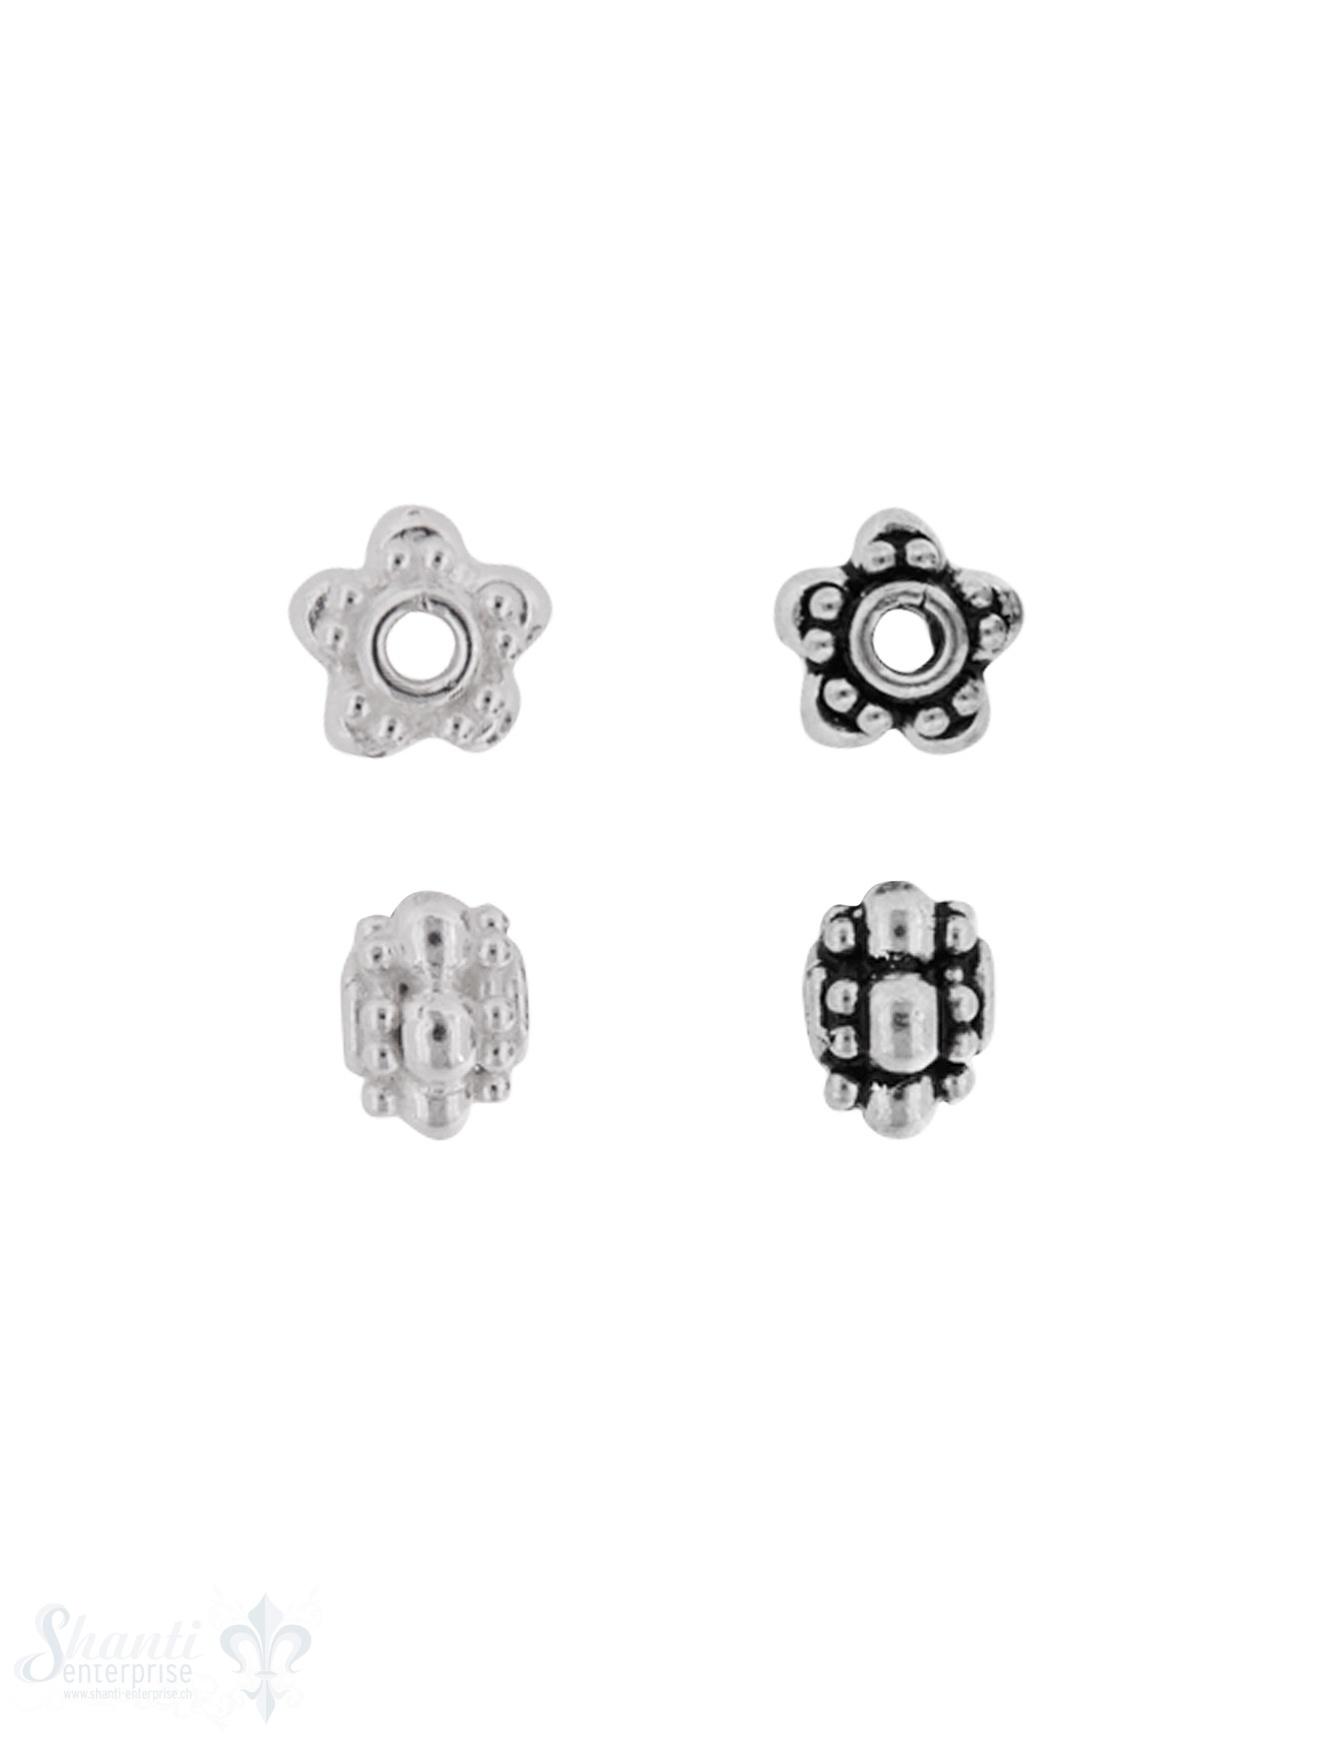 Zwischenteil Silber Blüemli breit verzi ert 9 mm Loch 2.2 mm Pack = 4 Stk.